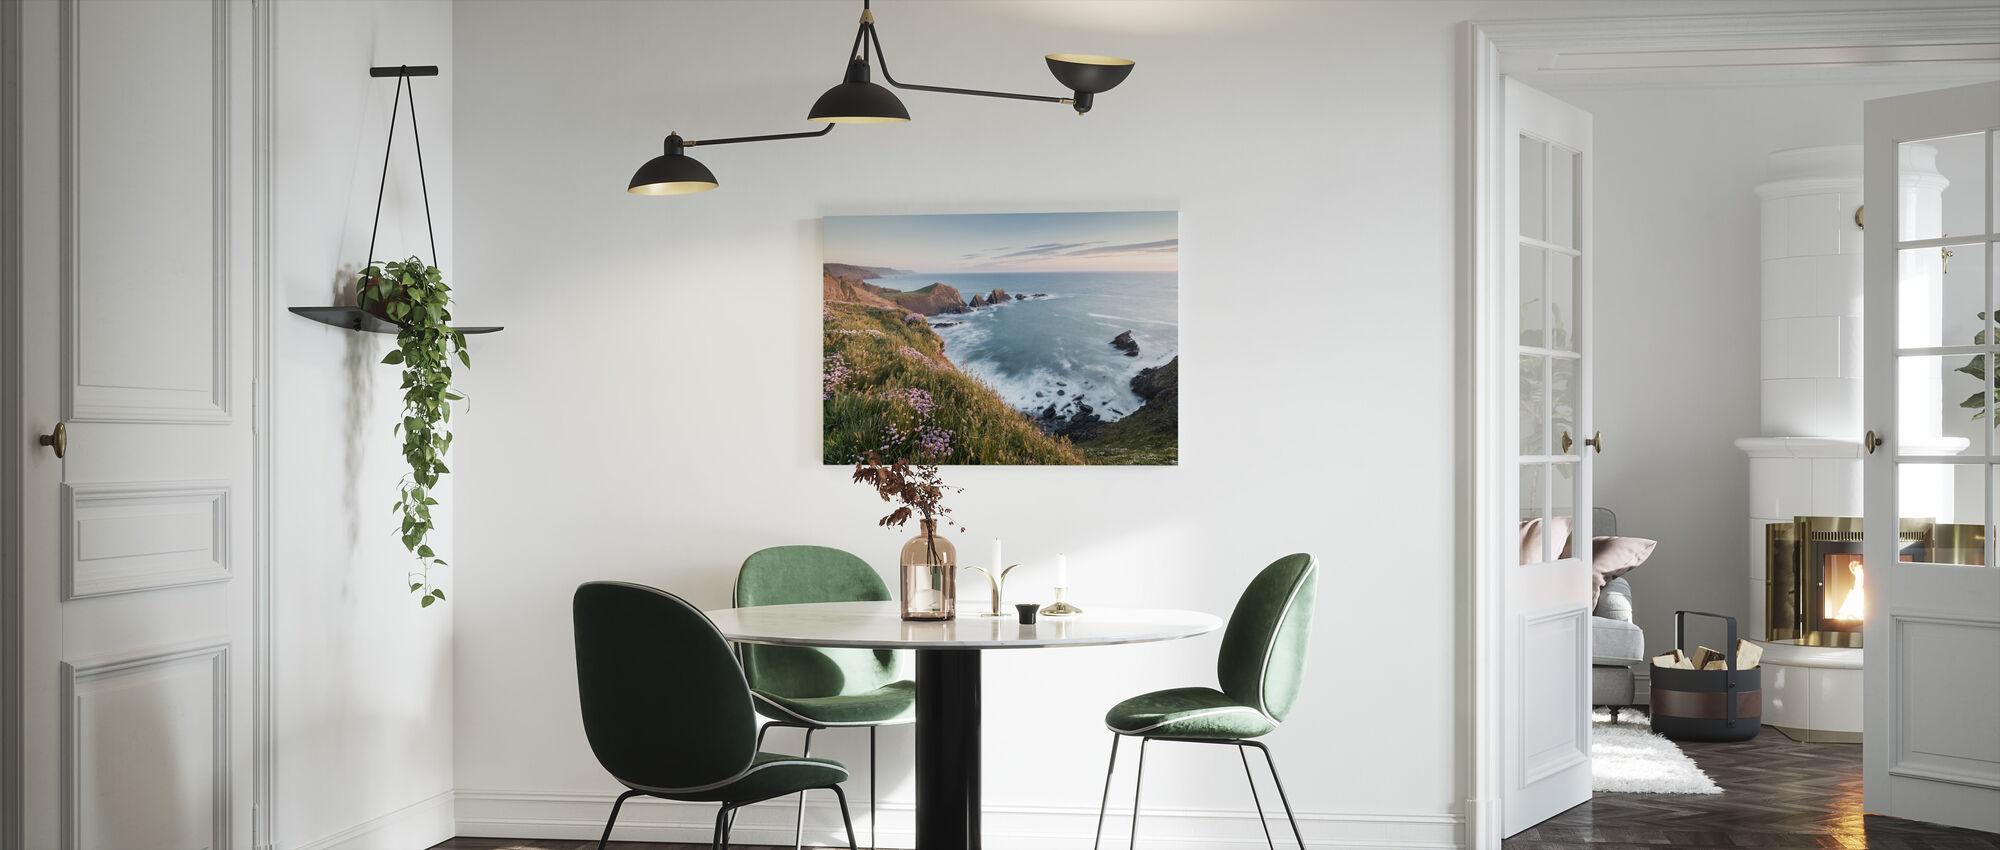 Wild Uitzicht - Canvas print - Keuken